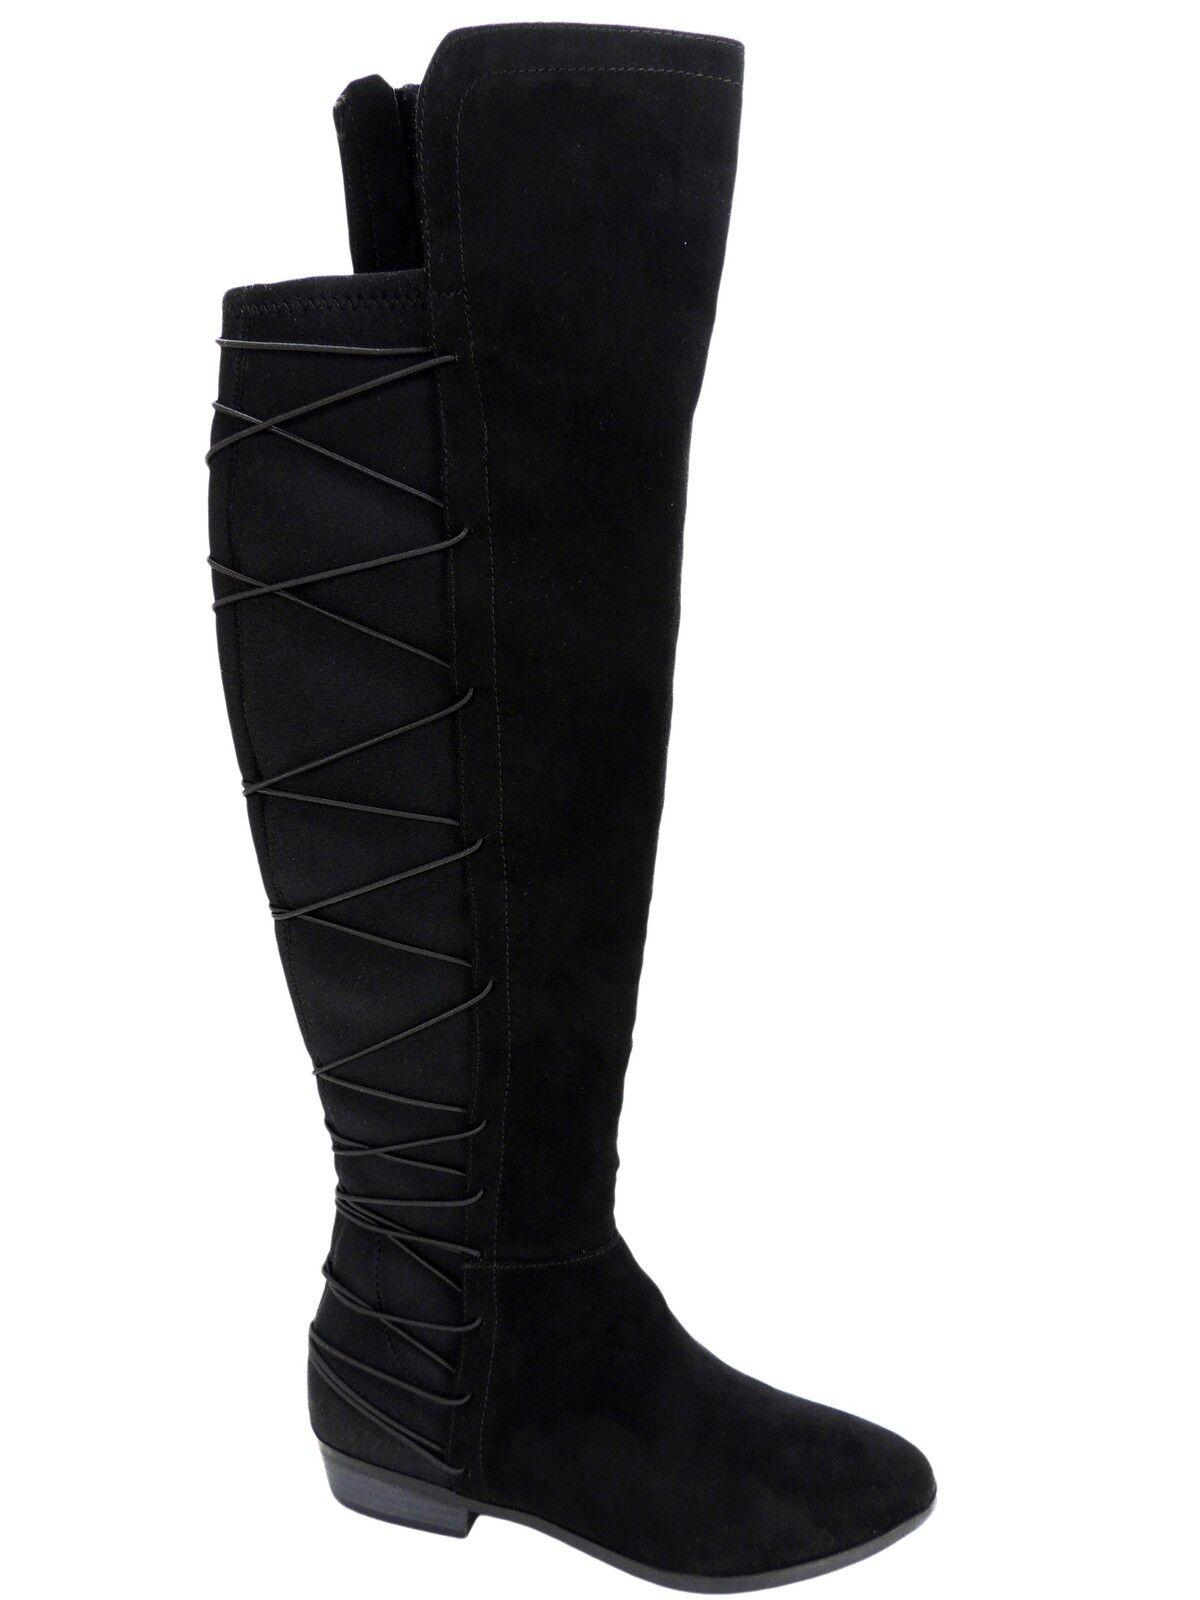 Material Girl Mujer Mujer Mujer Calyn sobre la rodilla con botas negras Talla 7 M  A la venta con descuento del 70%.